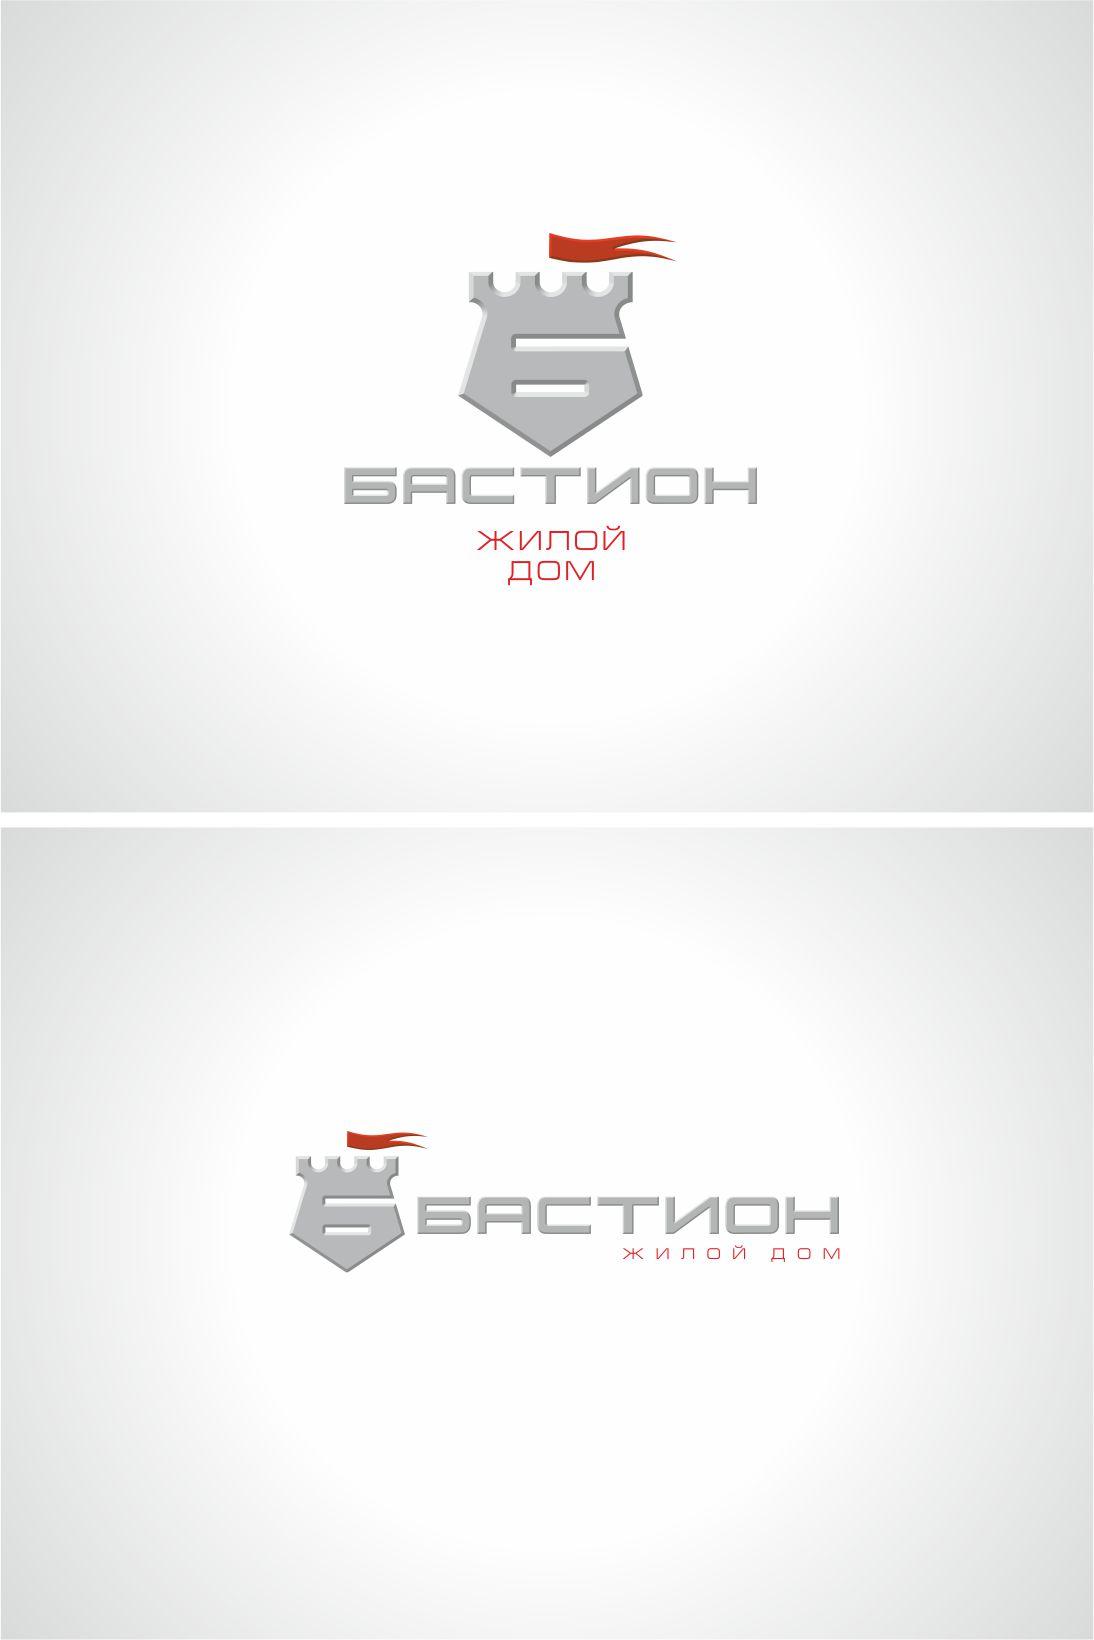 Разработка логотипа для жилого дома фото f_944520cc3614fa1a.jpg